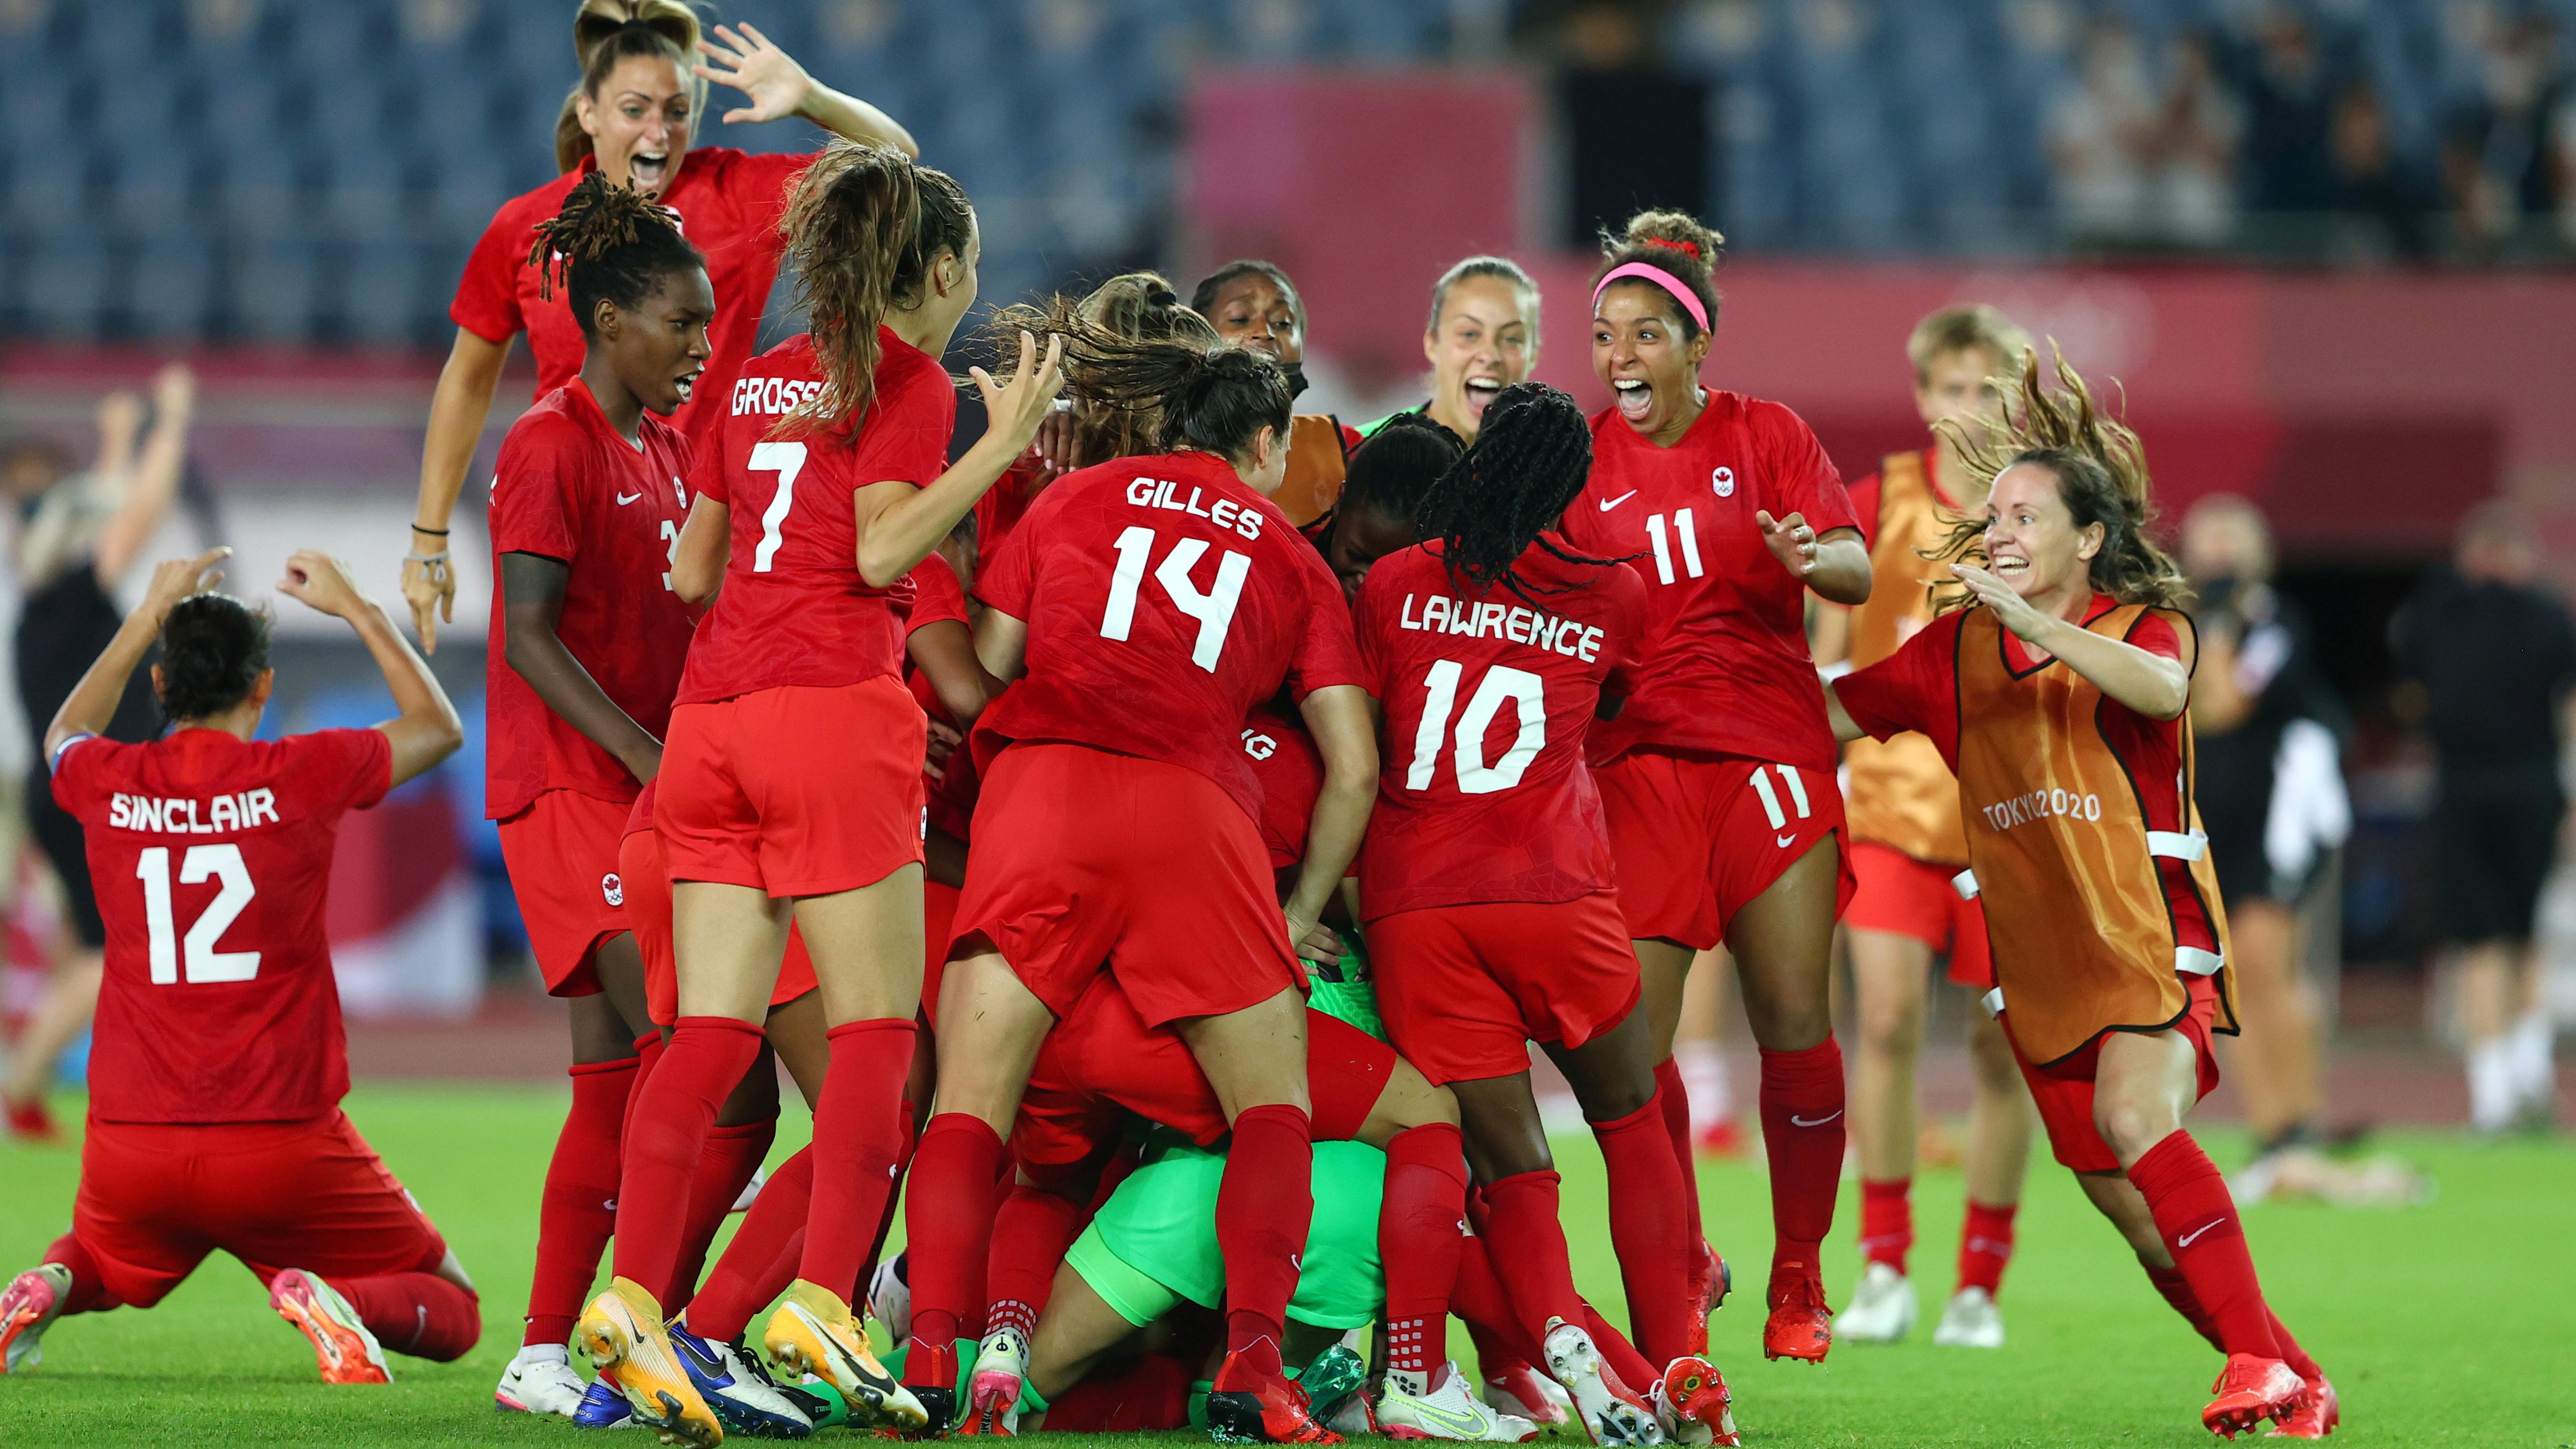 Tokyo 2020 Olympics - Soccer Football - Women - Quarterfinal - Canada v Brazil - Miyagi Stadium, Miyagi, Japan - July 30, 2021. Canada celebrate winning the match. REUTERS/Amr Abdallah Dalsh